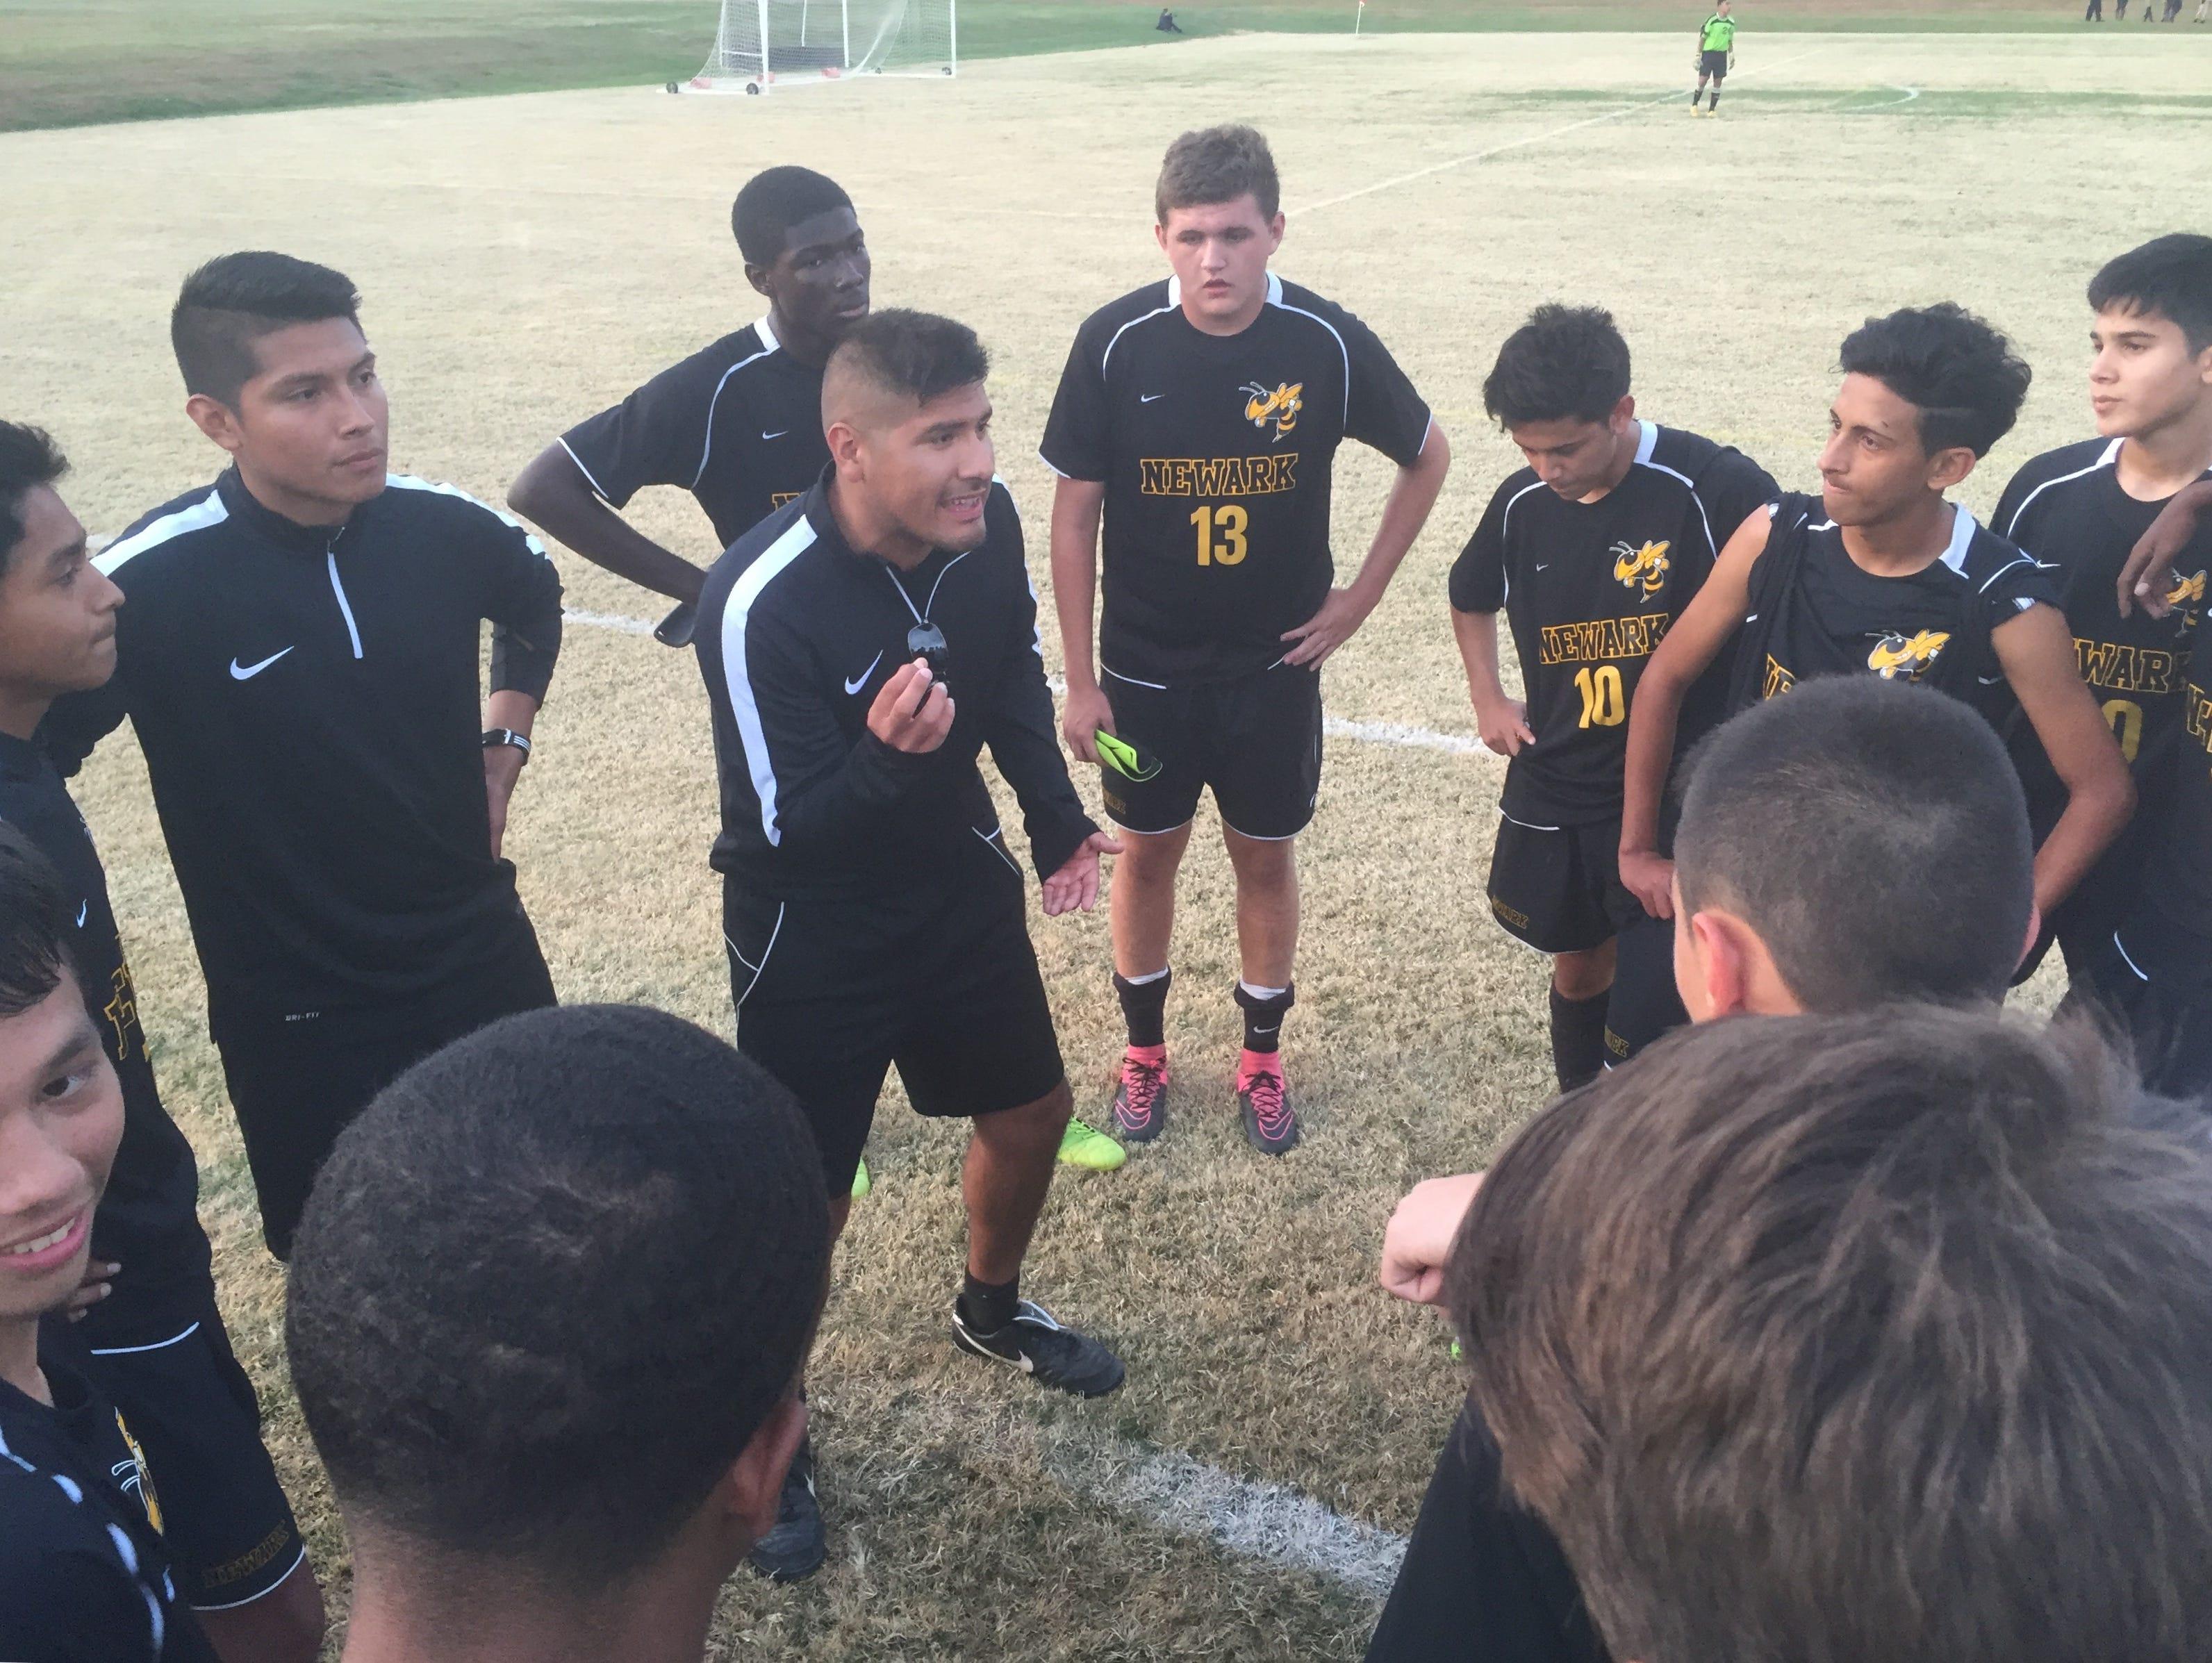 Newark boys soccer coach Diego Ruiz congratulates his team after their 2-1, double-overtime win at Delcastle on Thursday.